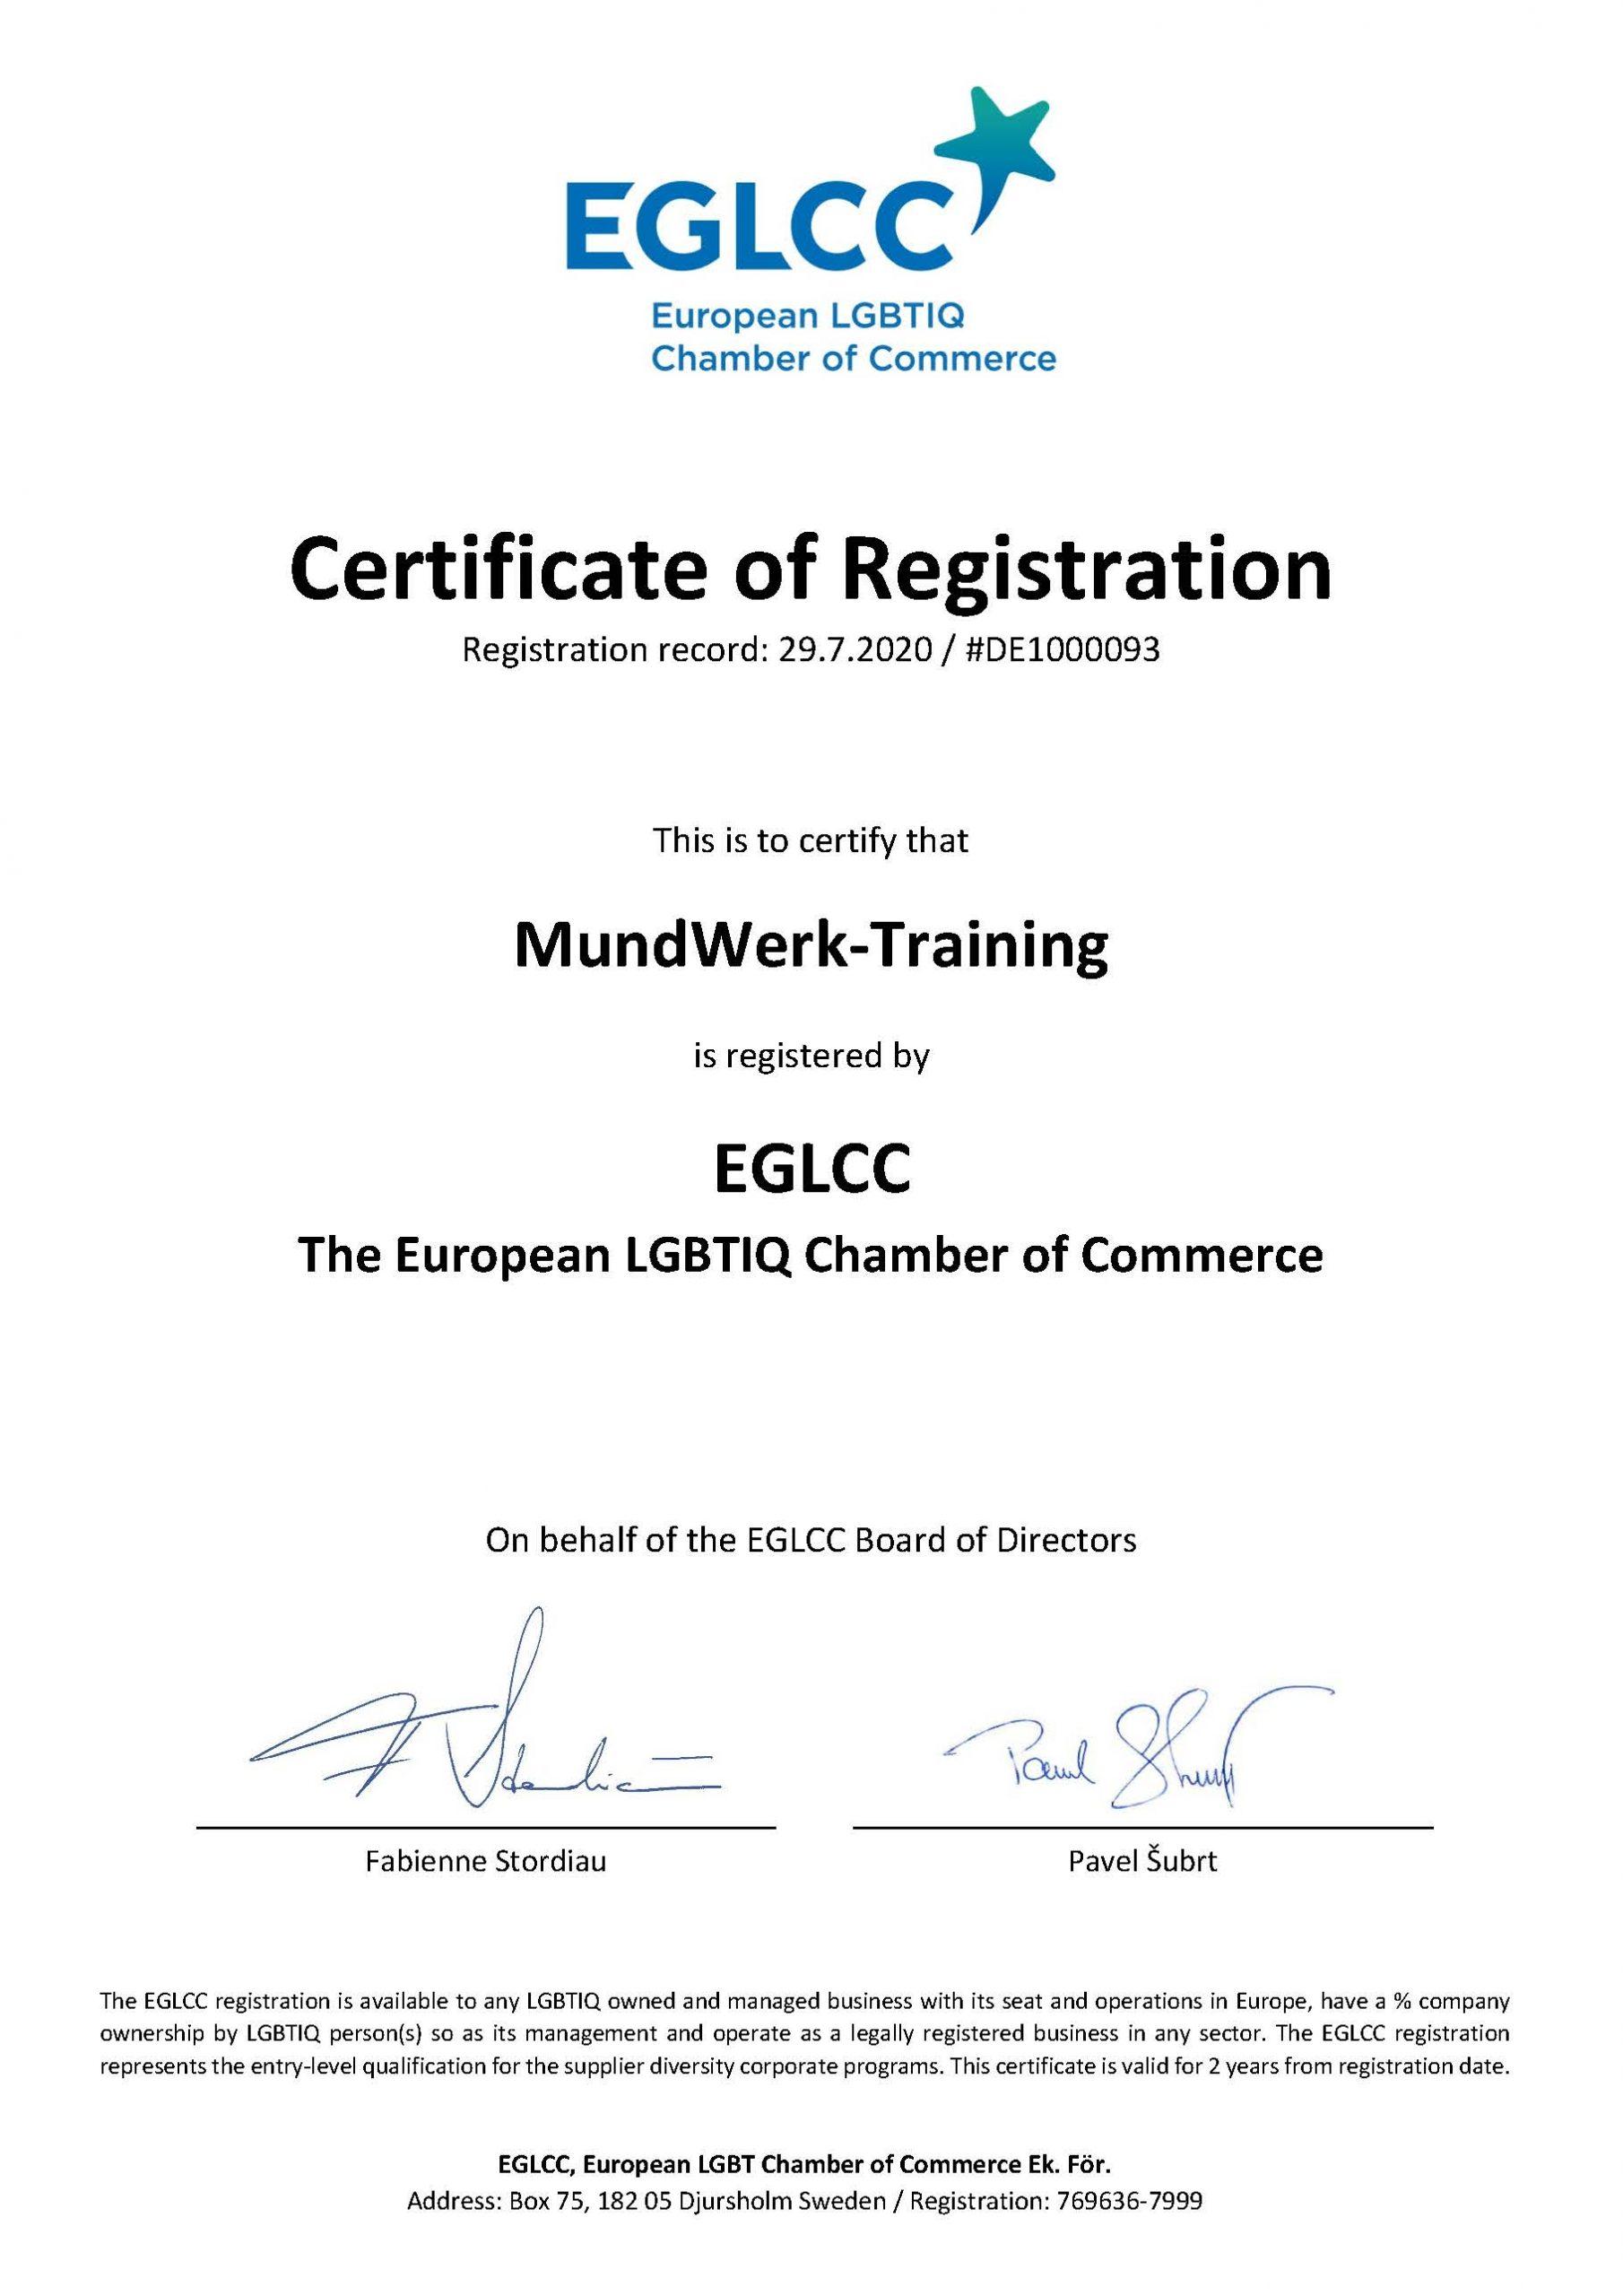 EGLCC Registration Certificate DE1000093 MundWerk-Training